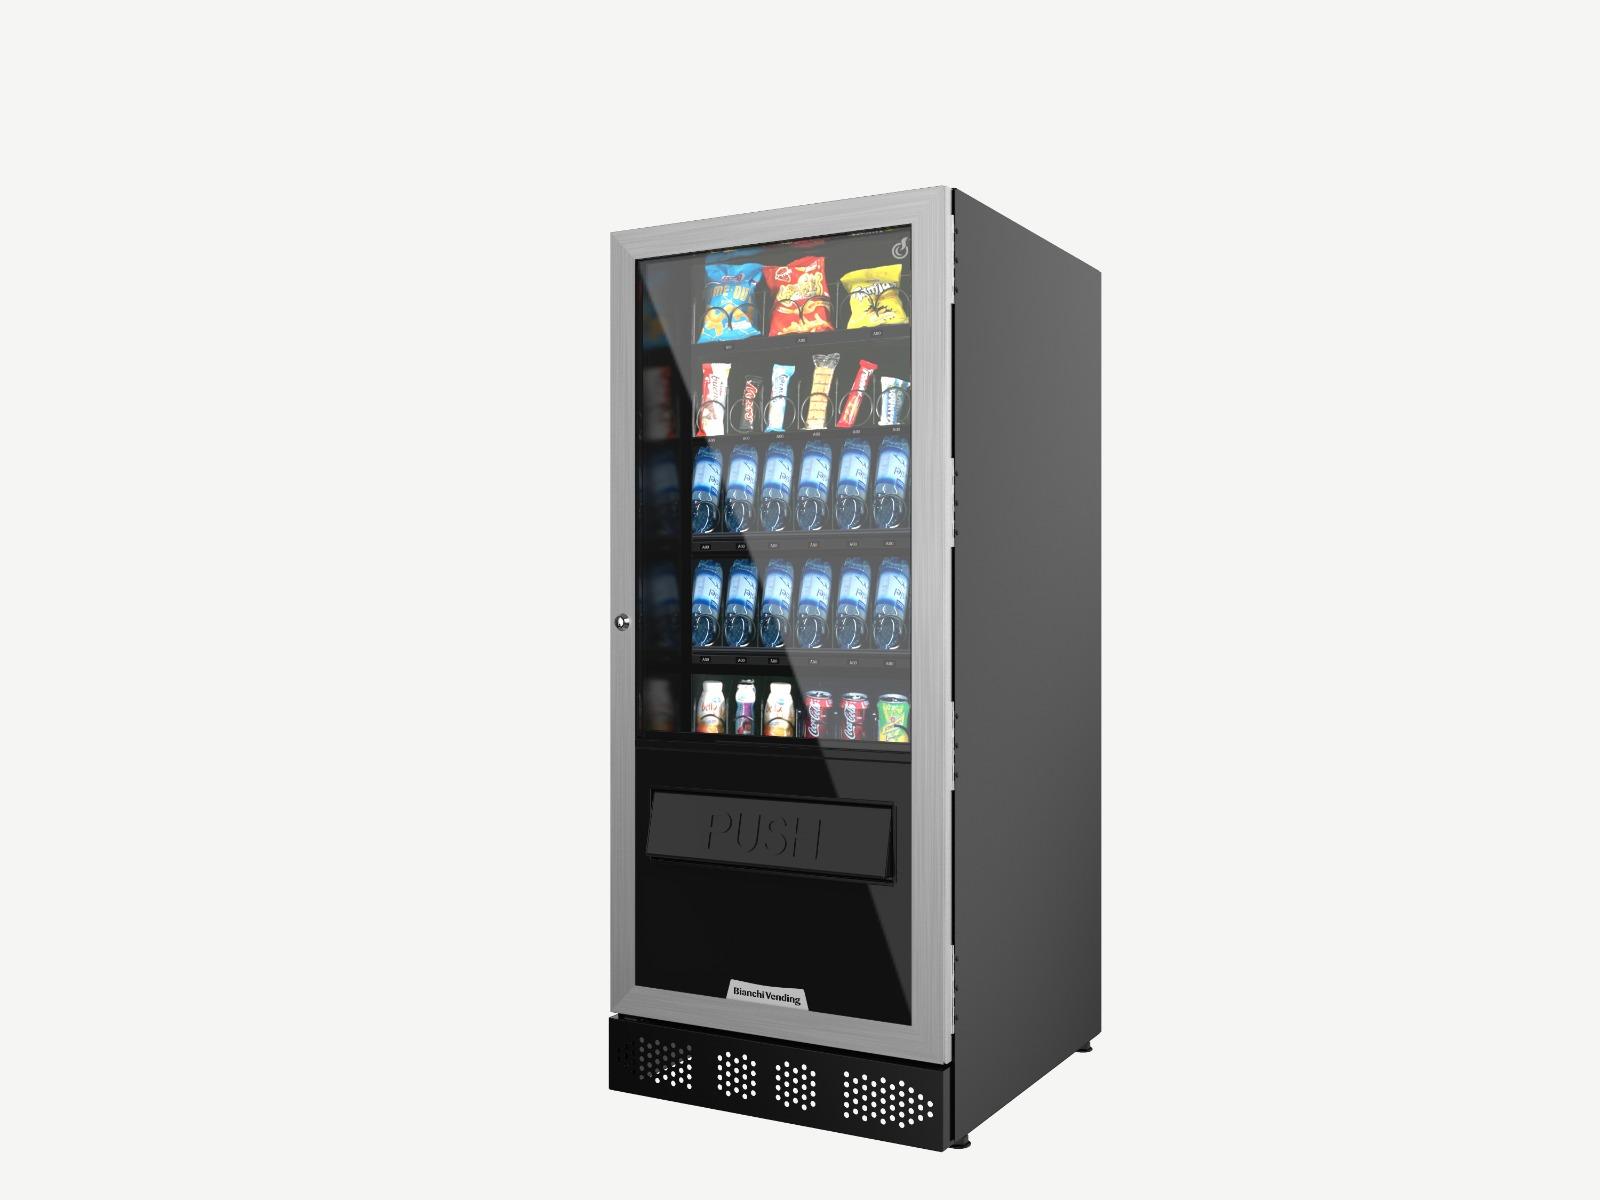 AL8CMA03BV | Снековый автомат Bianchi Aria L EVO 6-44 MA Alfa | Coffee Shop